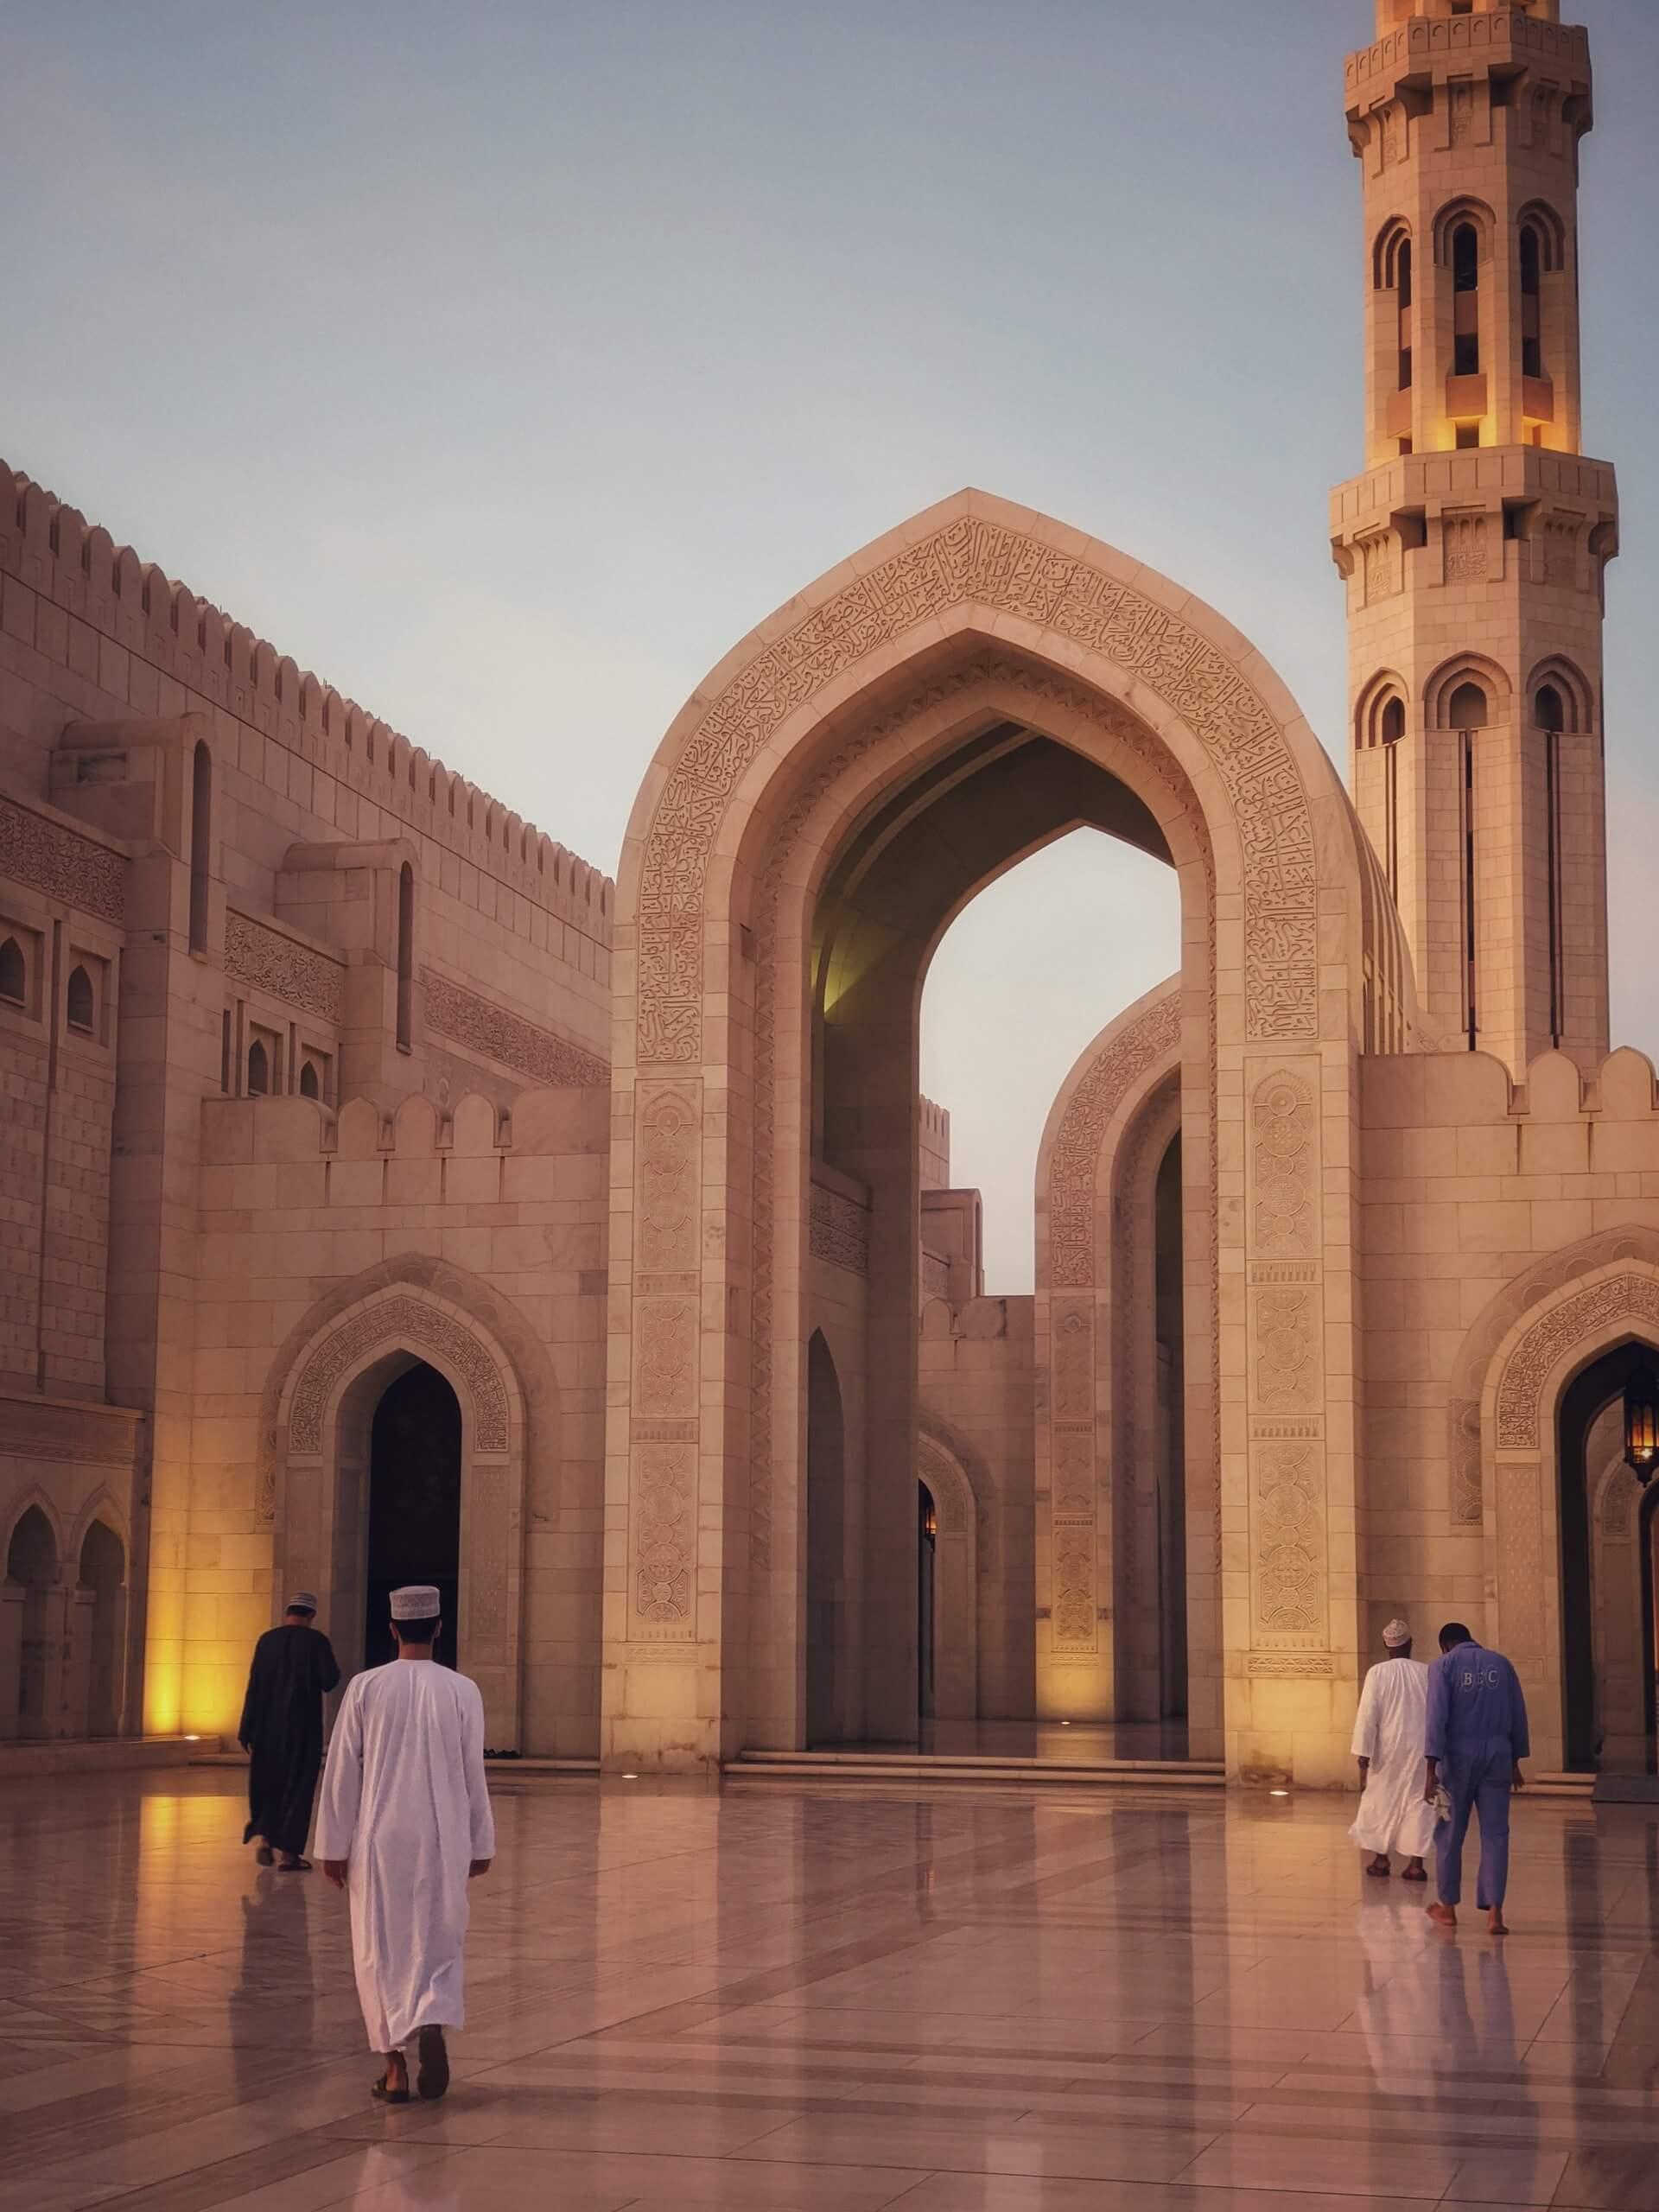 Several Omani men attending prayer at the Sultan Qaboos Mosque